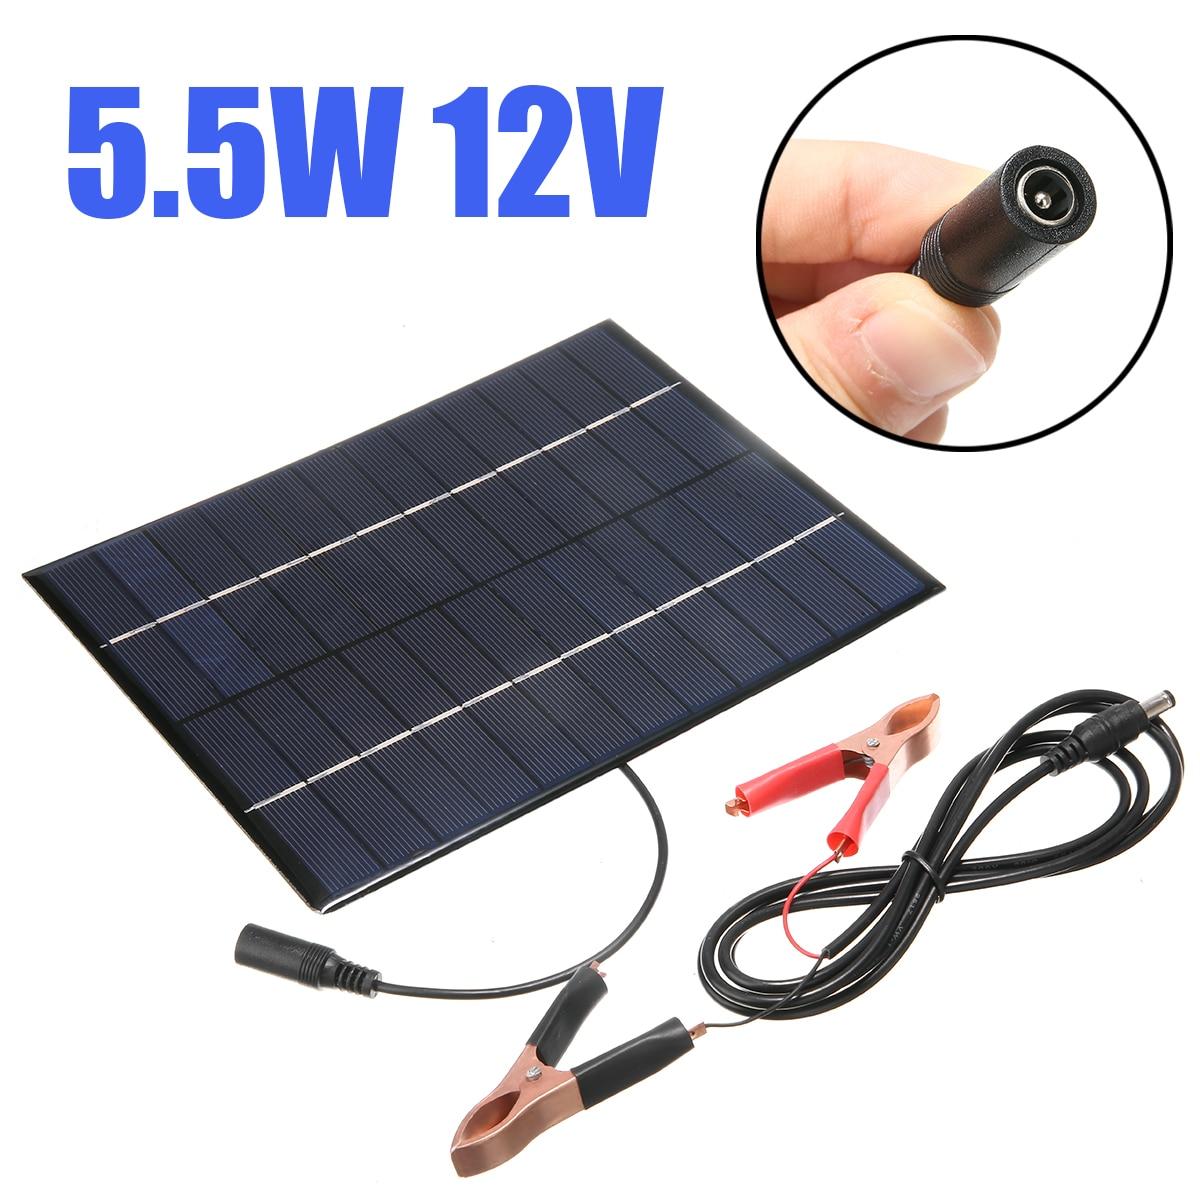 modulo de energia do painel solar carregador de bateria carro barco acampamento automovel motocicleta eletrica painel